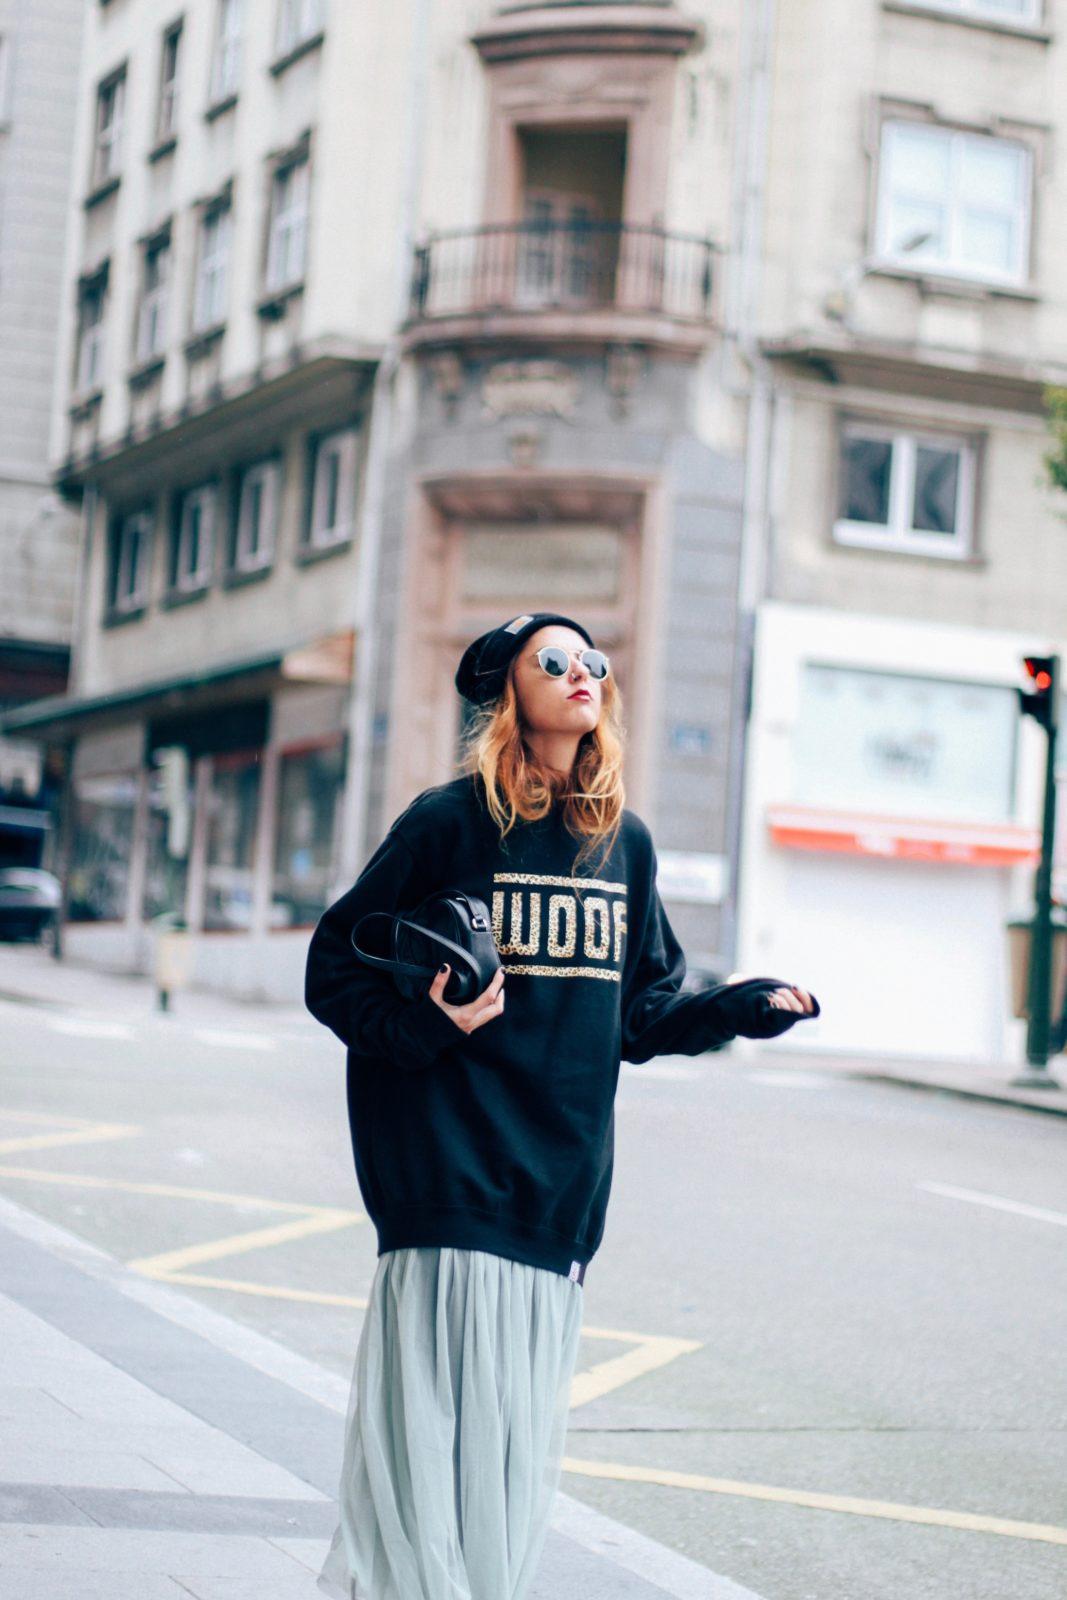 sudadera_old_dogs_falda_de_tul_vans_beanie_carhartt_look_donkeycool_street_style-20